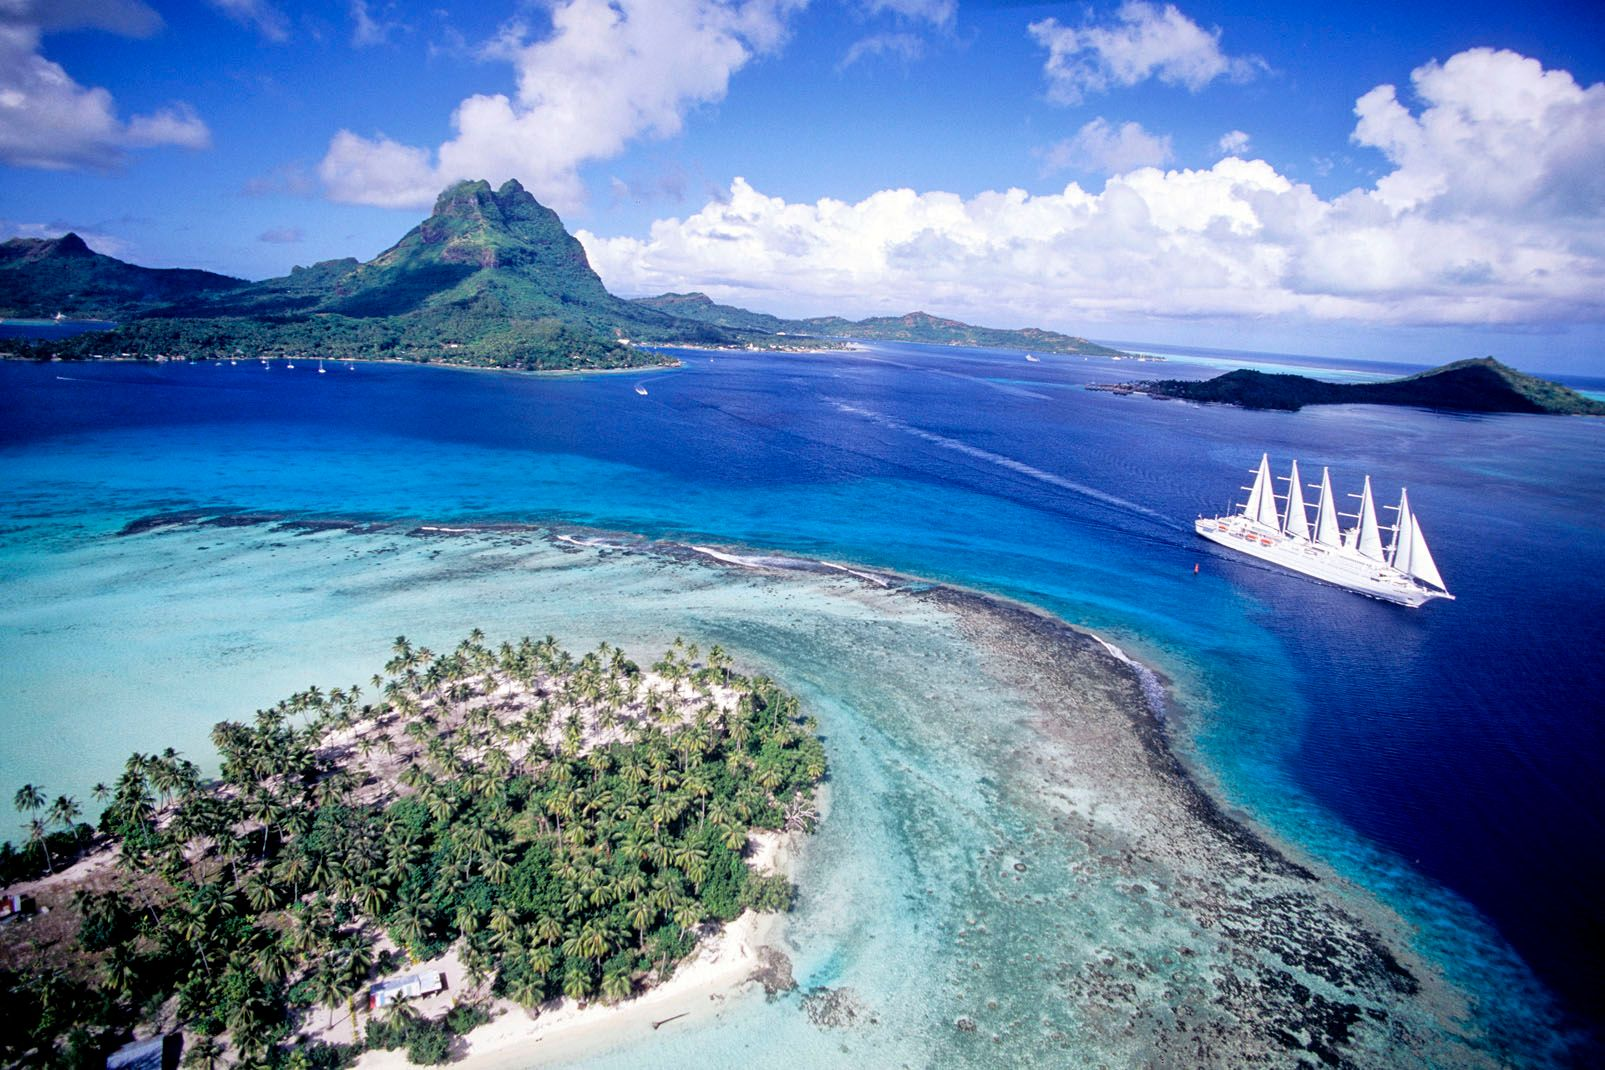 Travel Time To Bora Bora From Us